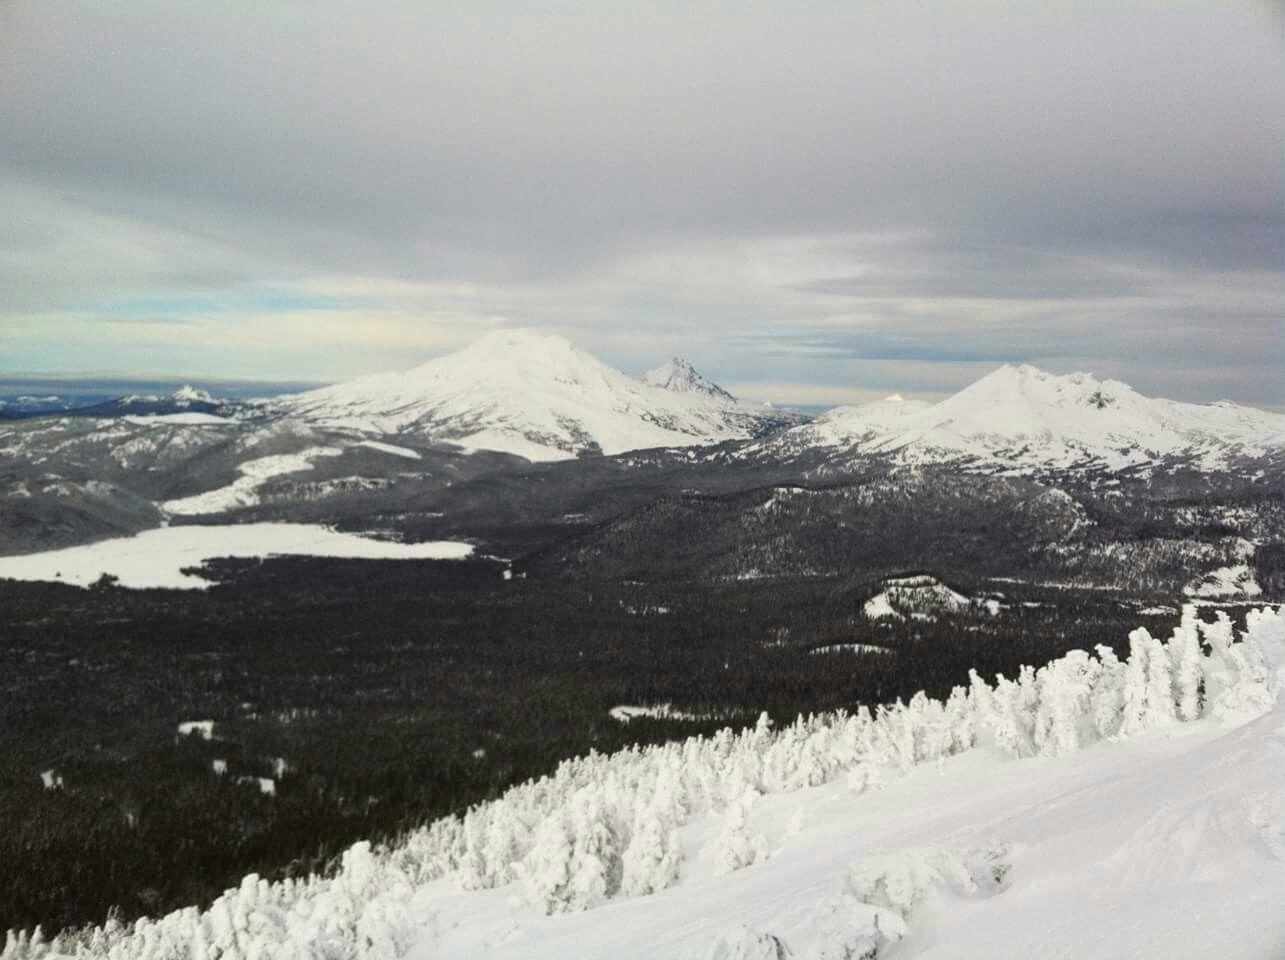 Mt. Bachelor, Bend, Oregon